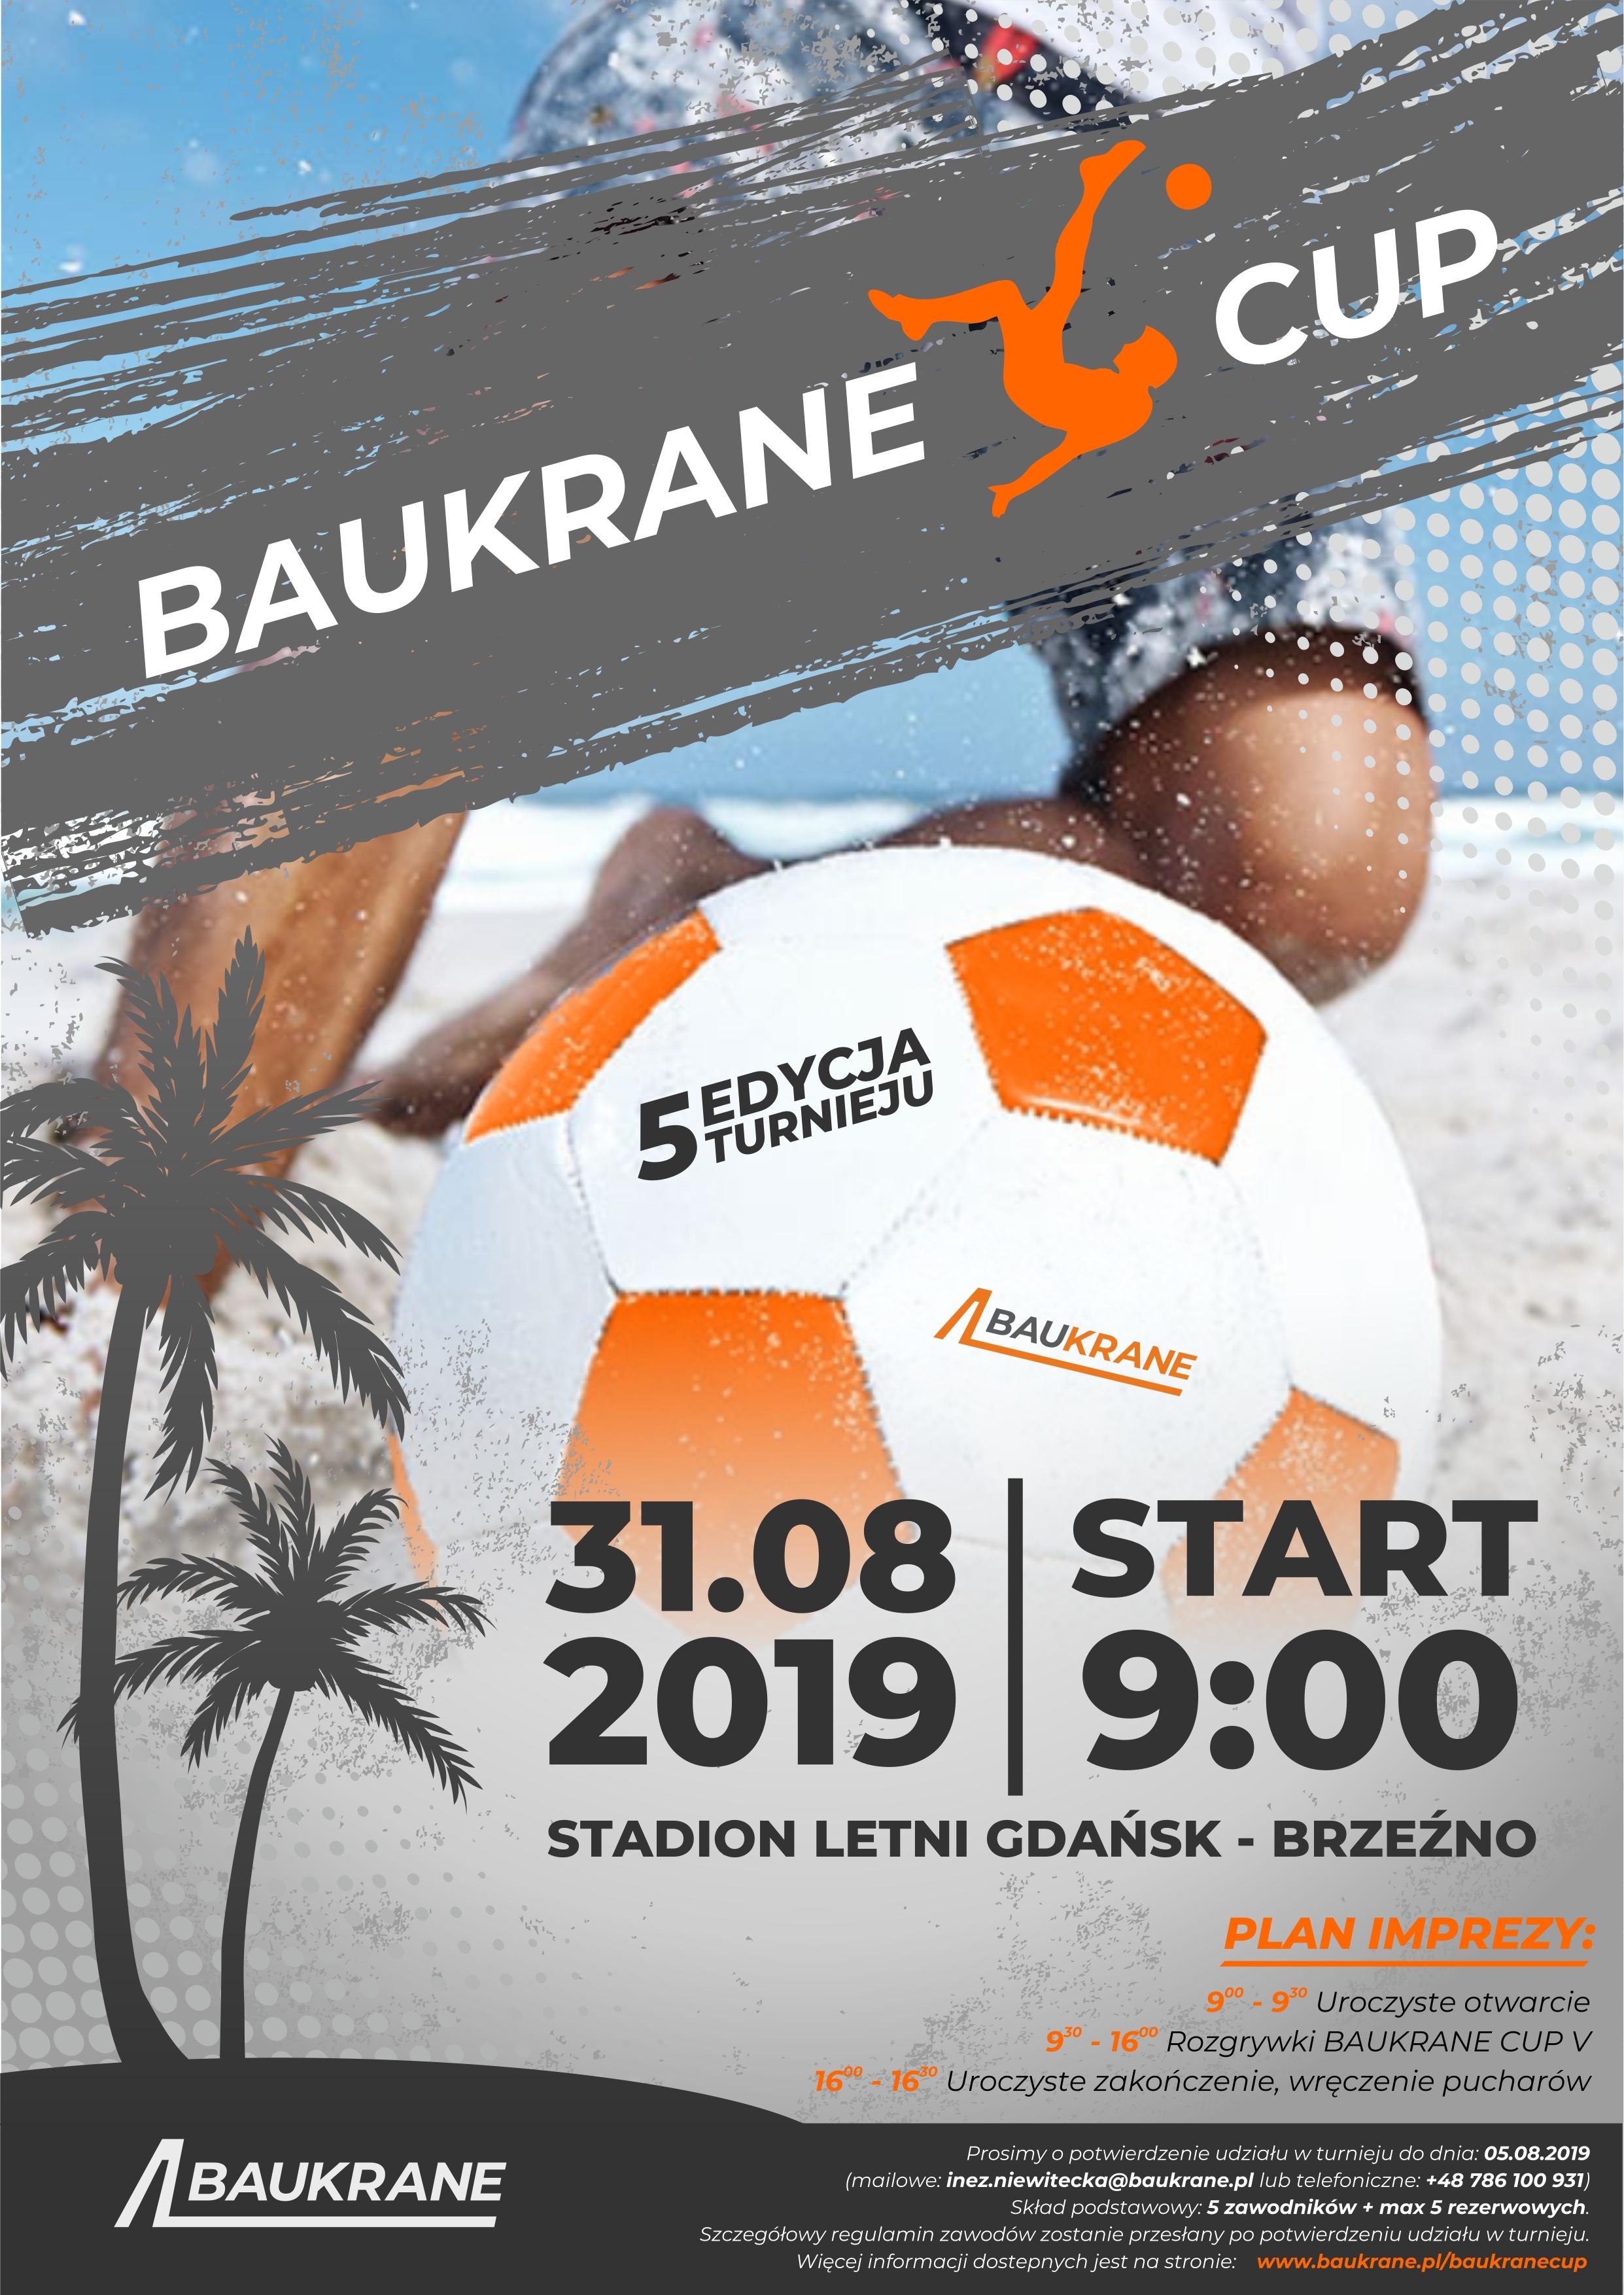 zaproszenie 2019 baukrane cup